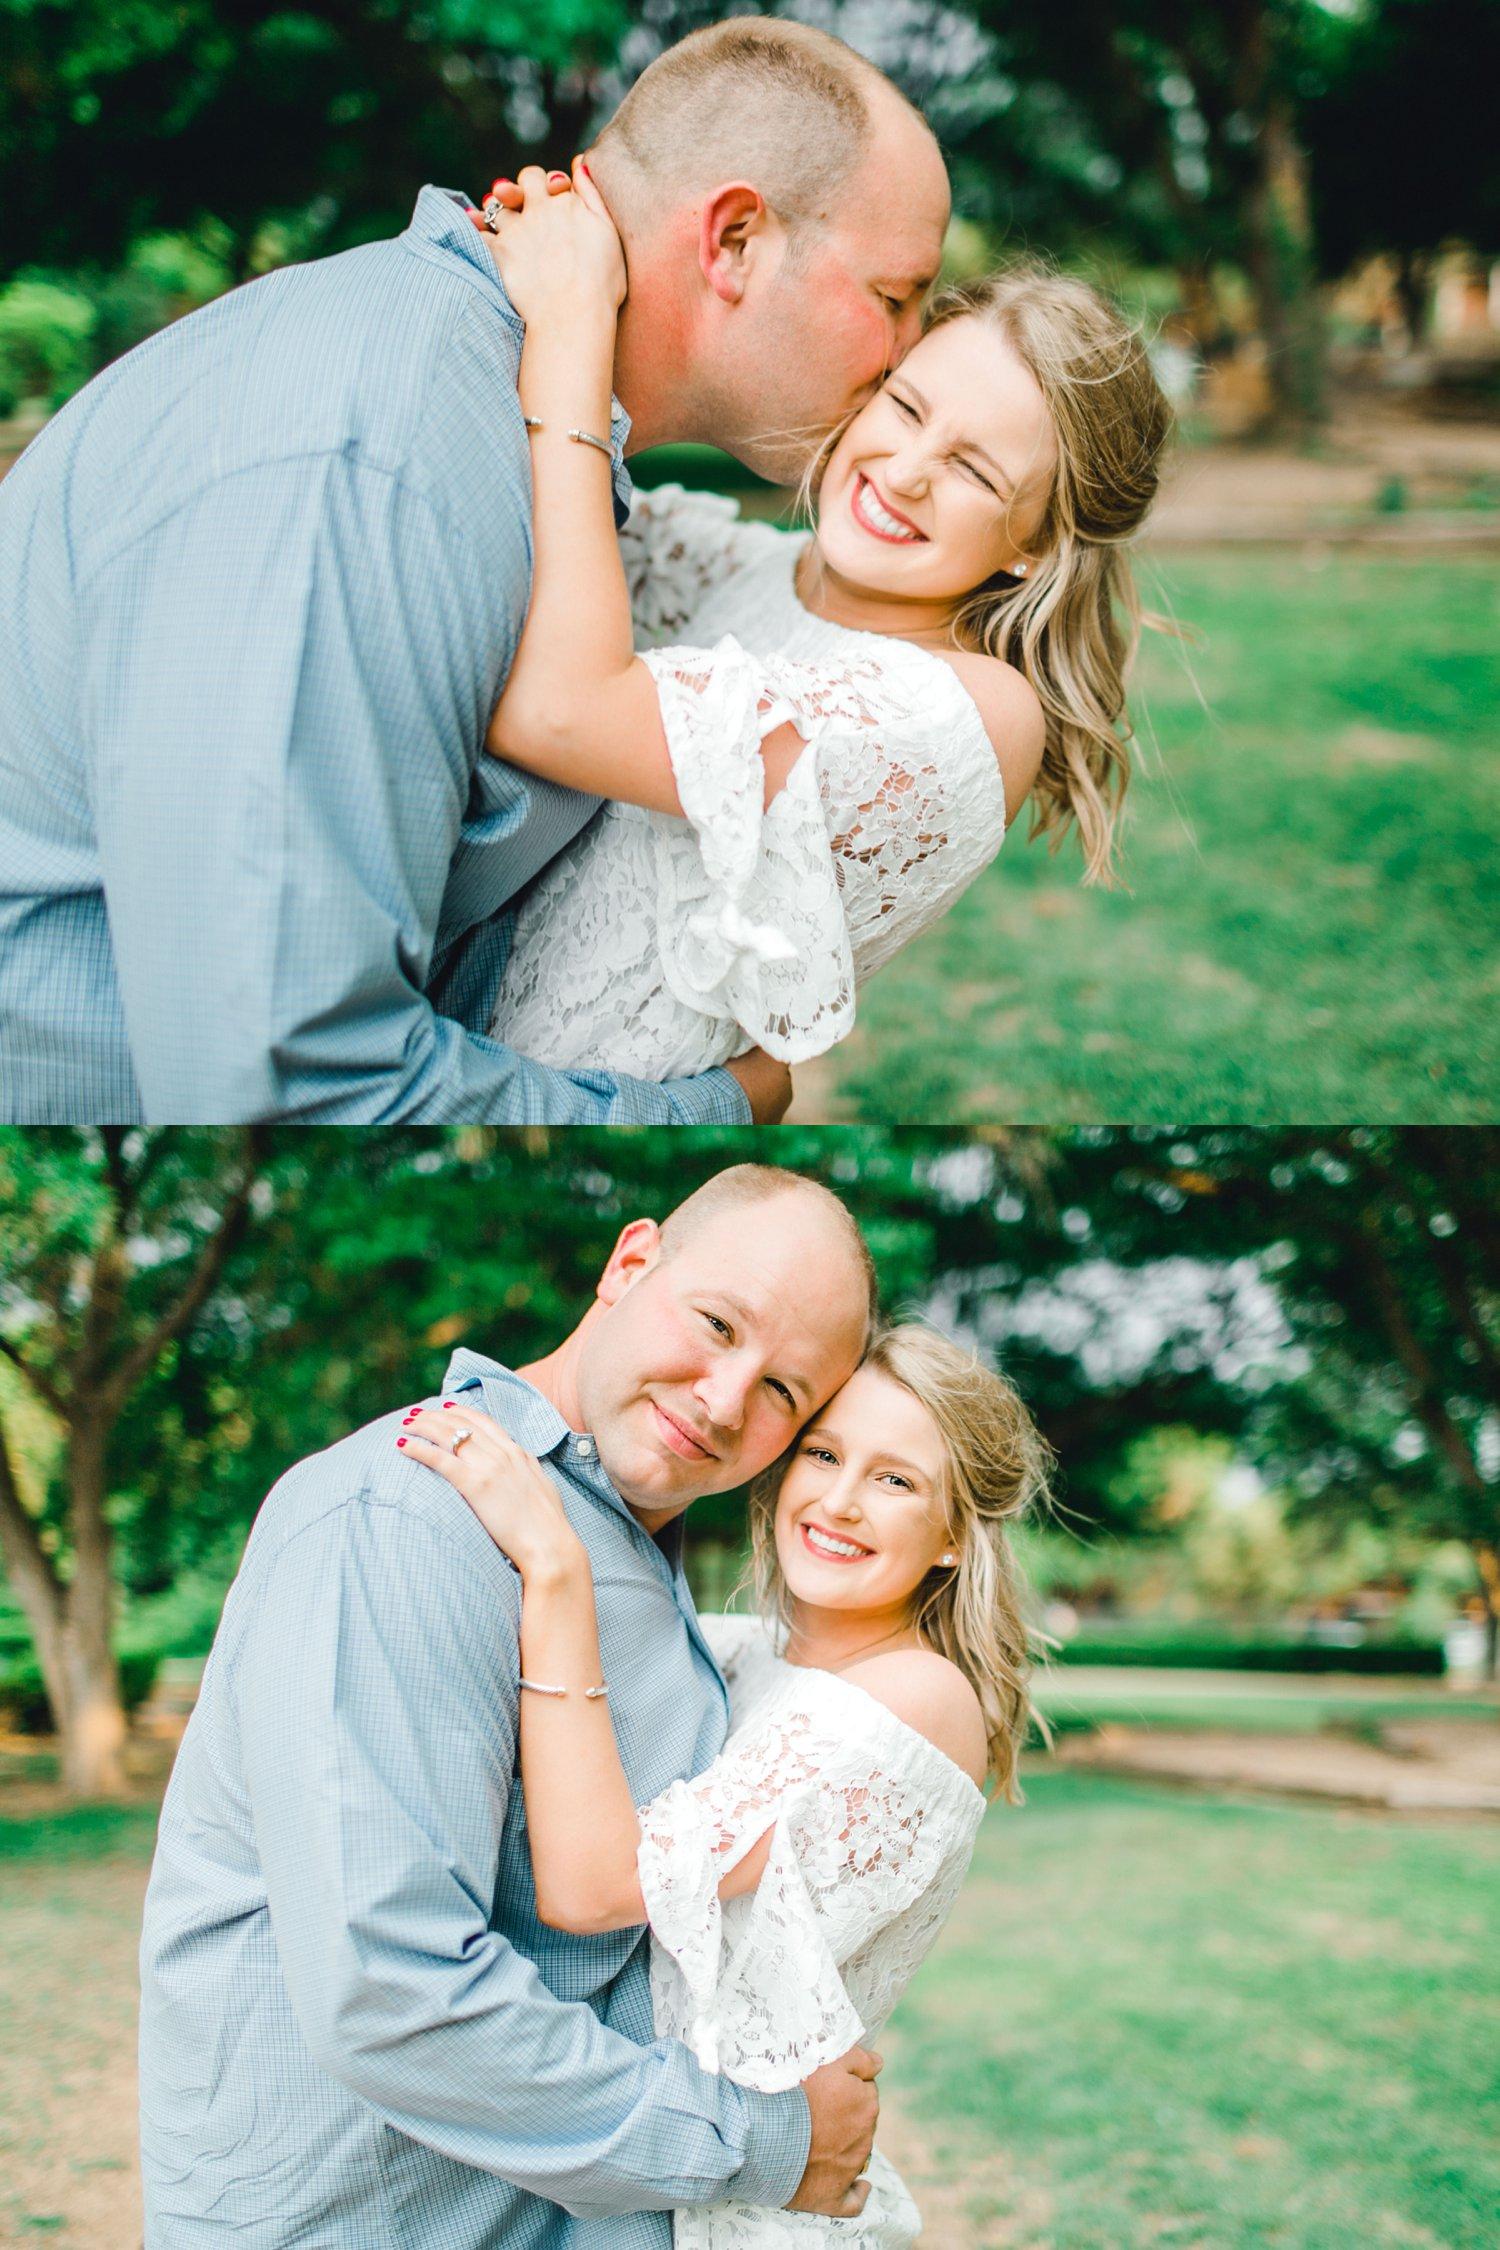 Morgan_and_Chris_Hebert_ALLEEJ_Engagement_Photographer_Lubbock_0049.jpg